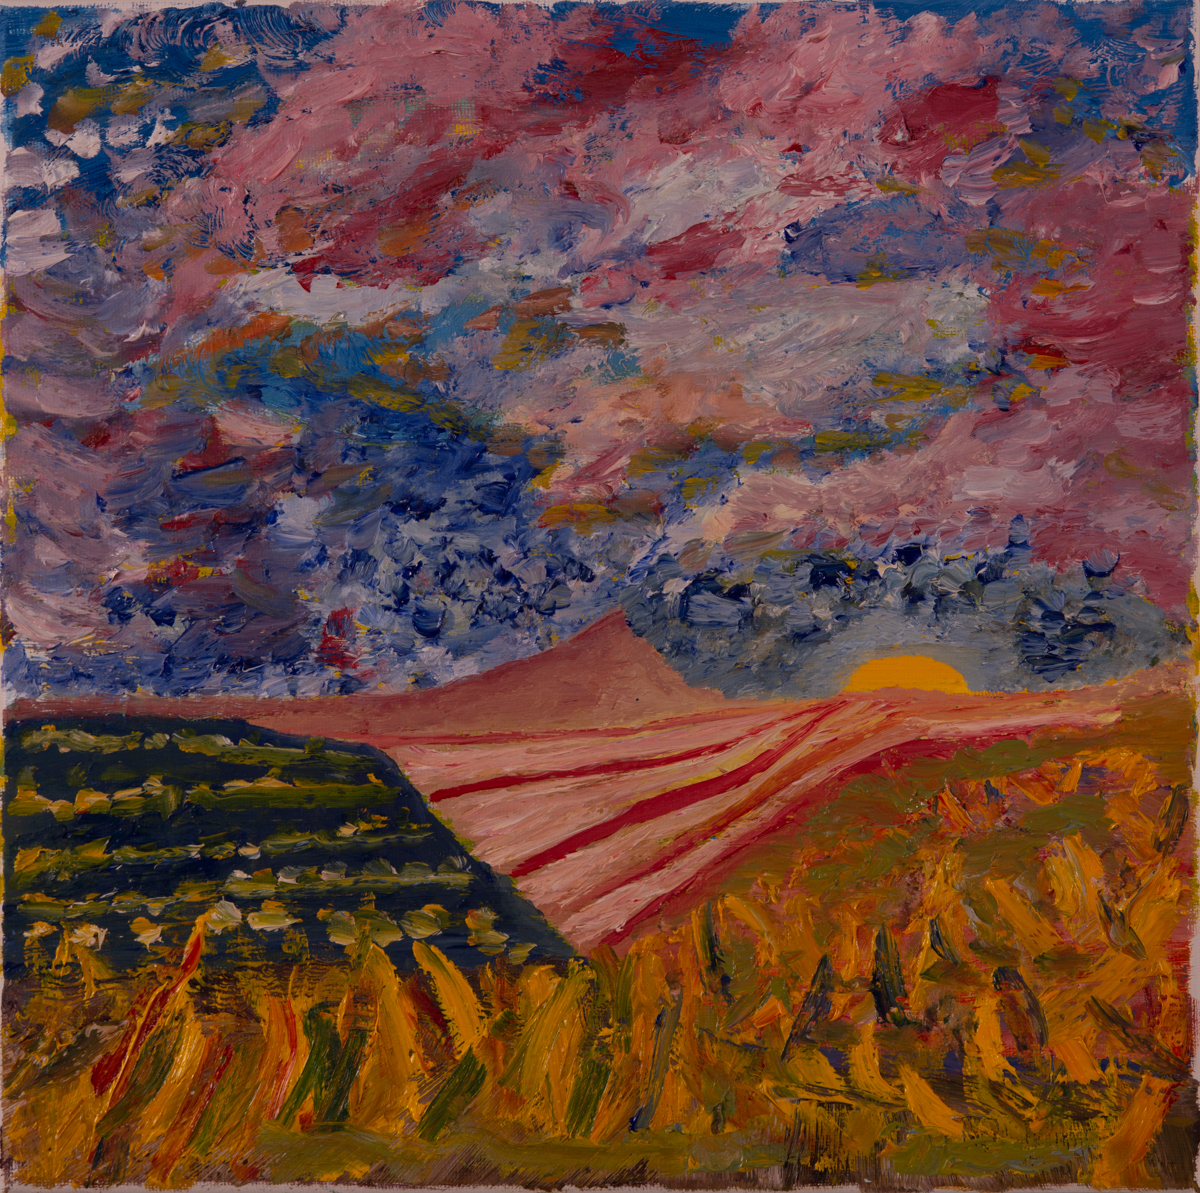 American Prairie: Hope  by Doug Distaso